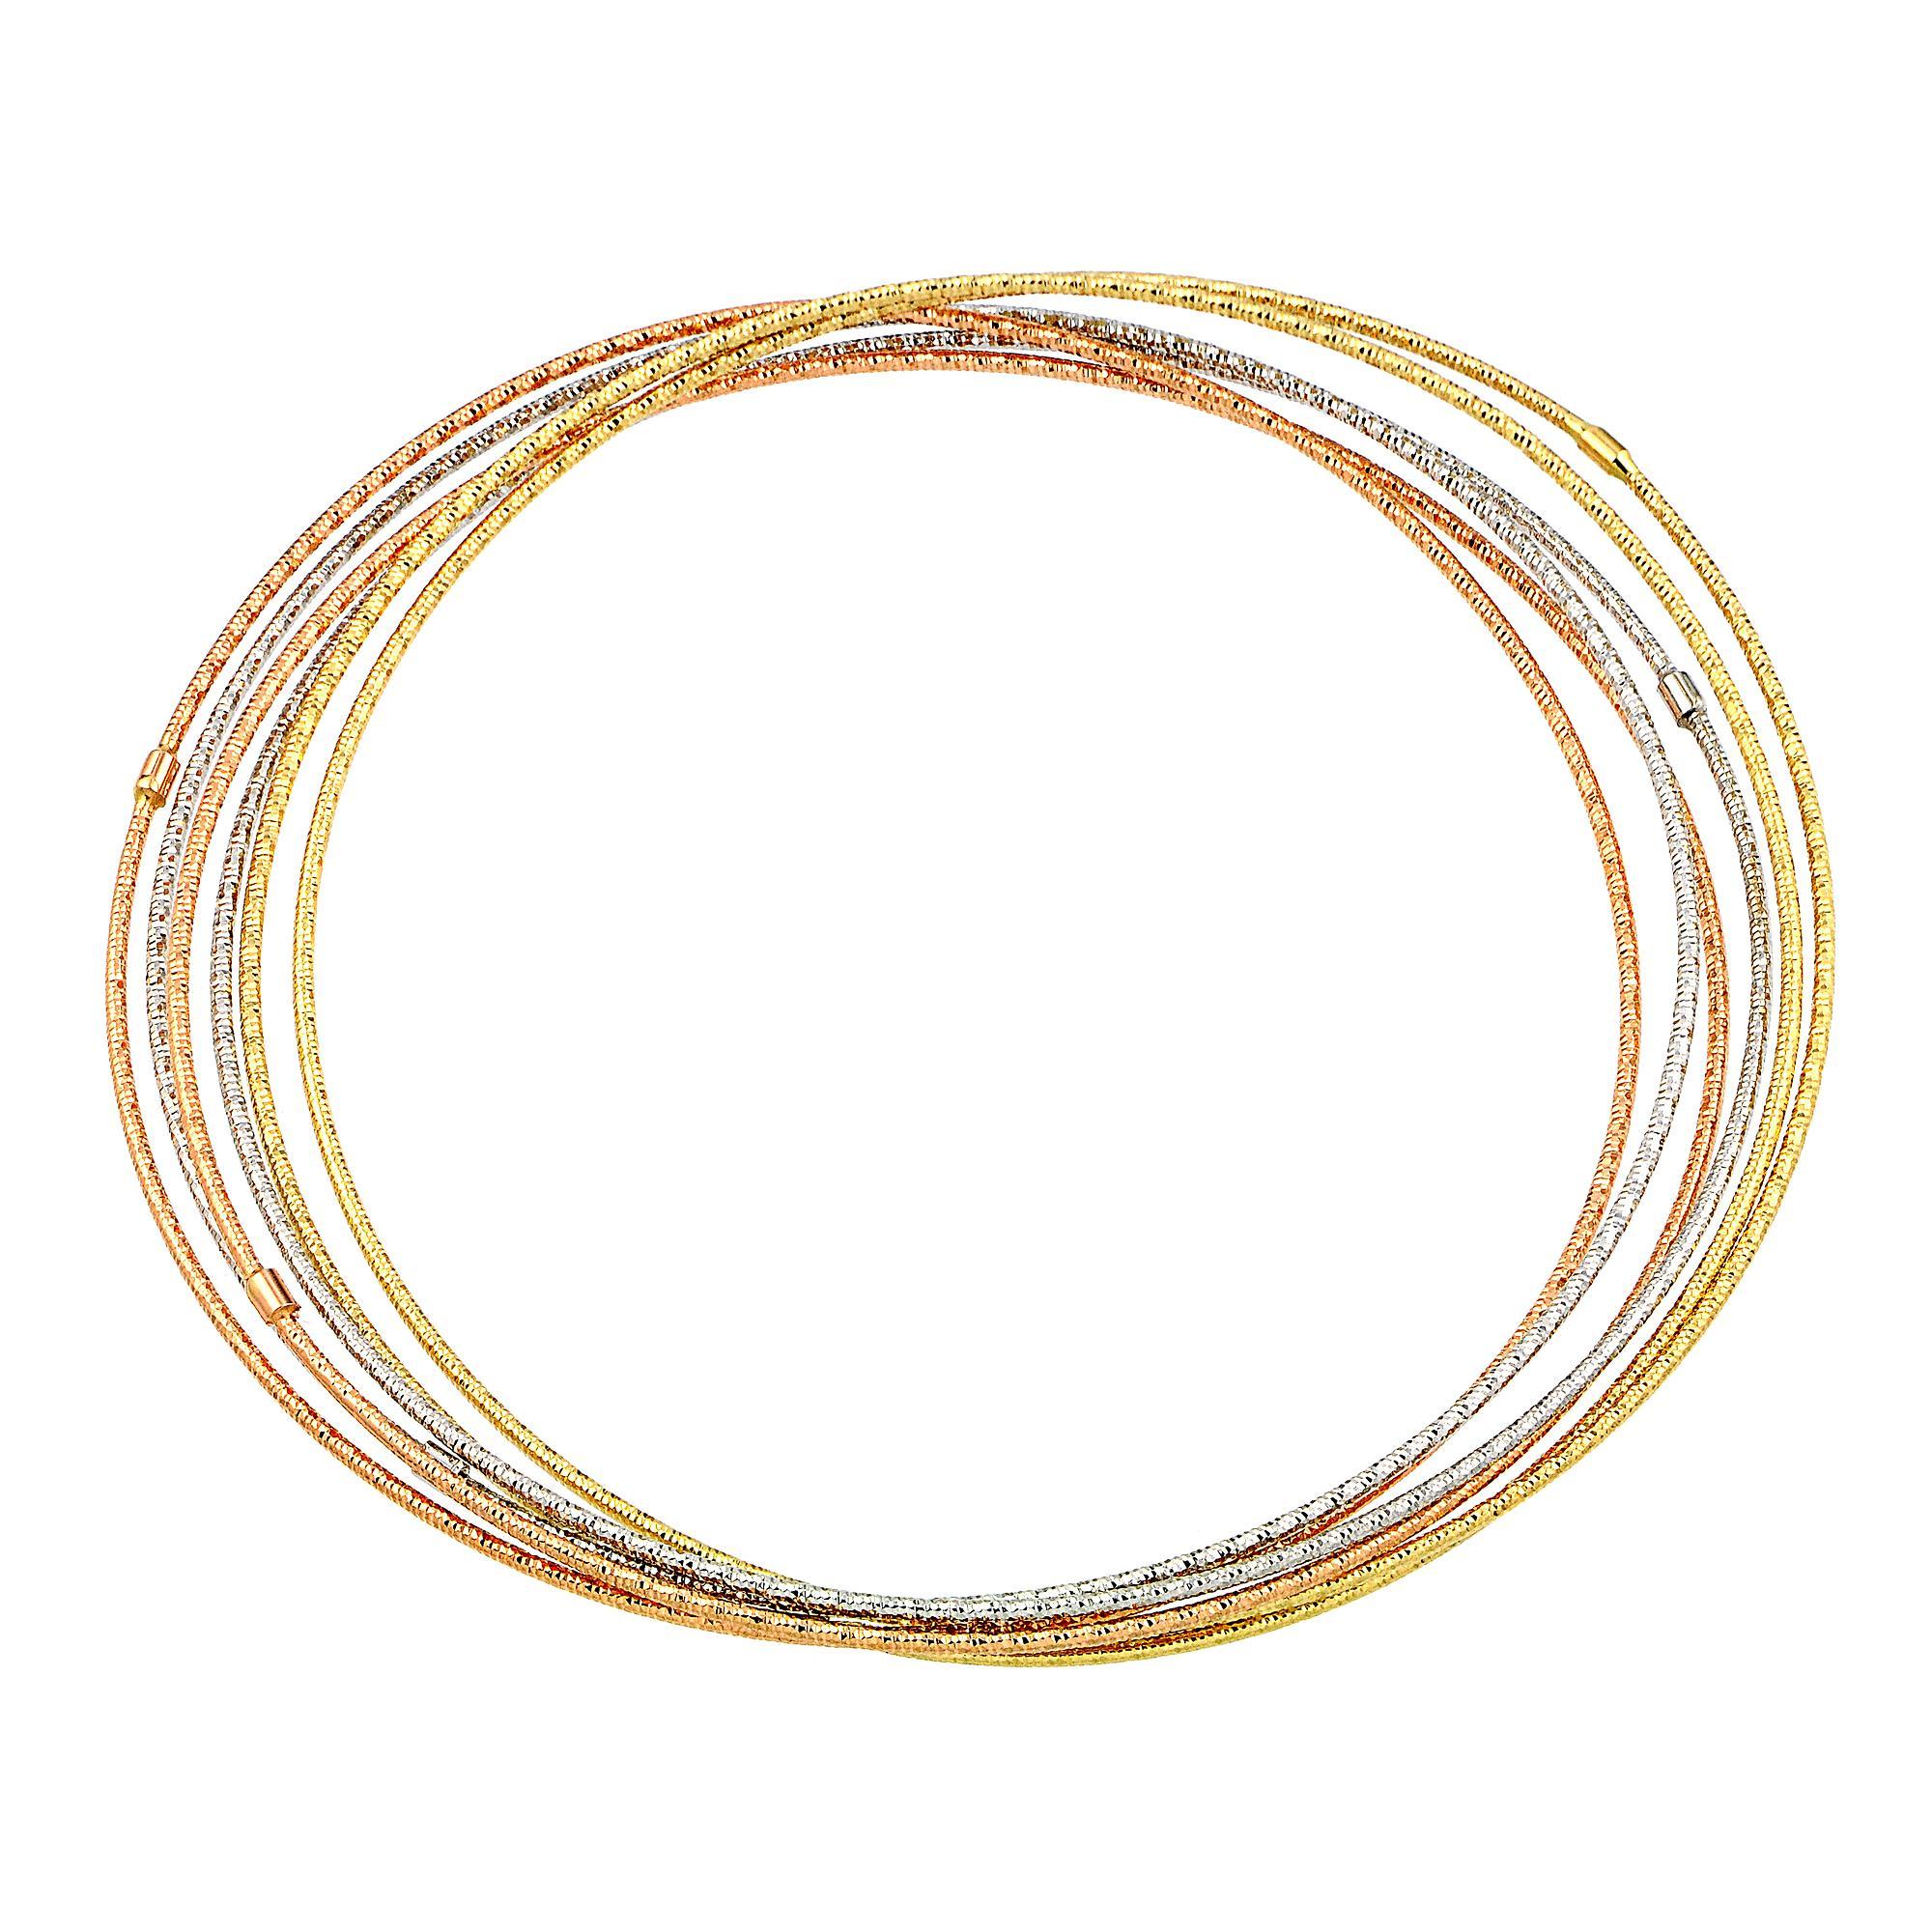 Amazon Com 14k Yellow Gold Diamond Cut 7 Day Bangle Bracelet 6